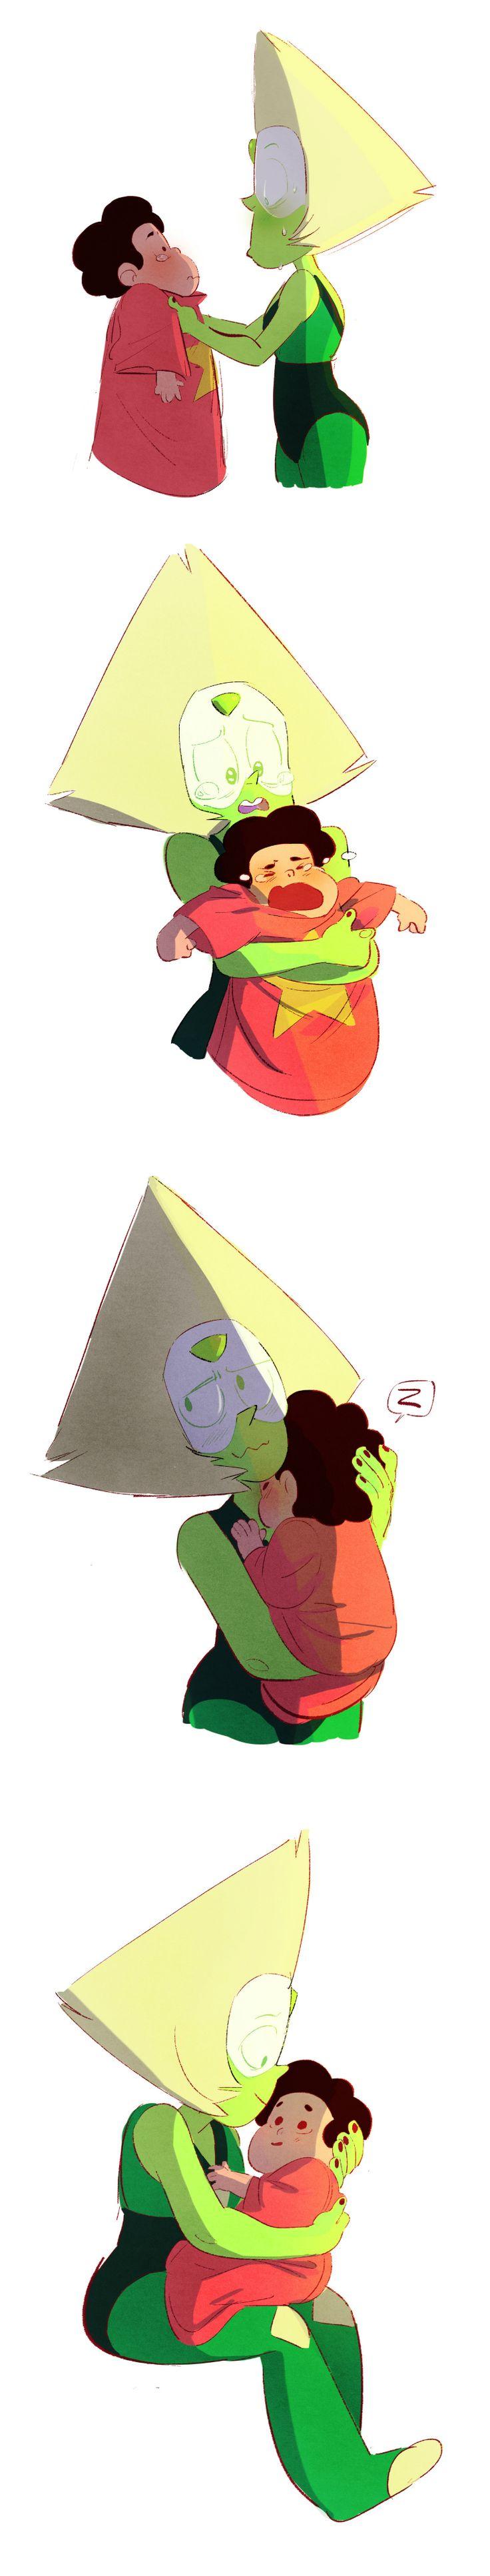 Taking Care of Baby Steven, Steven Universe, Peridot